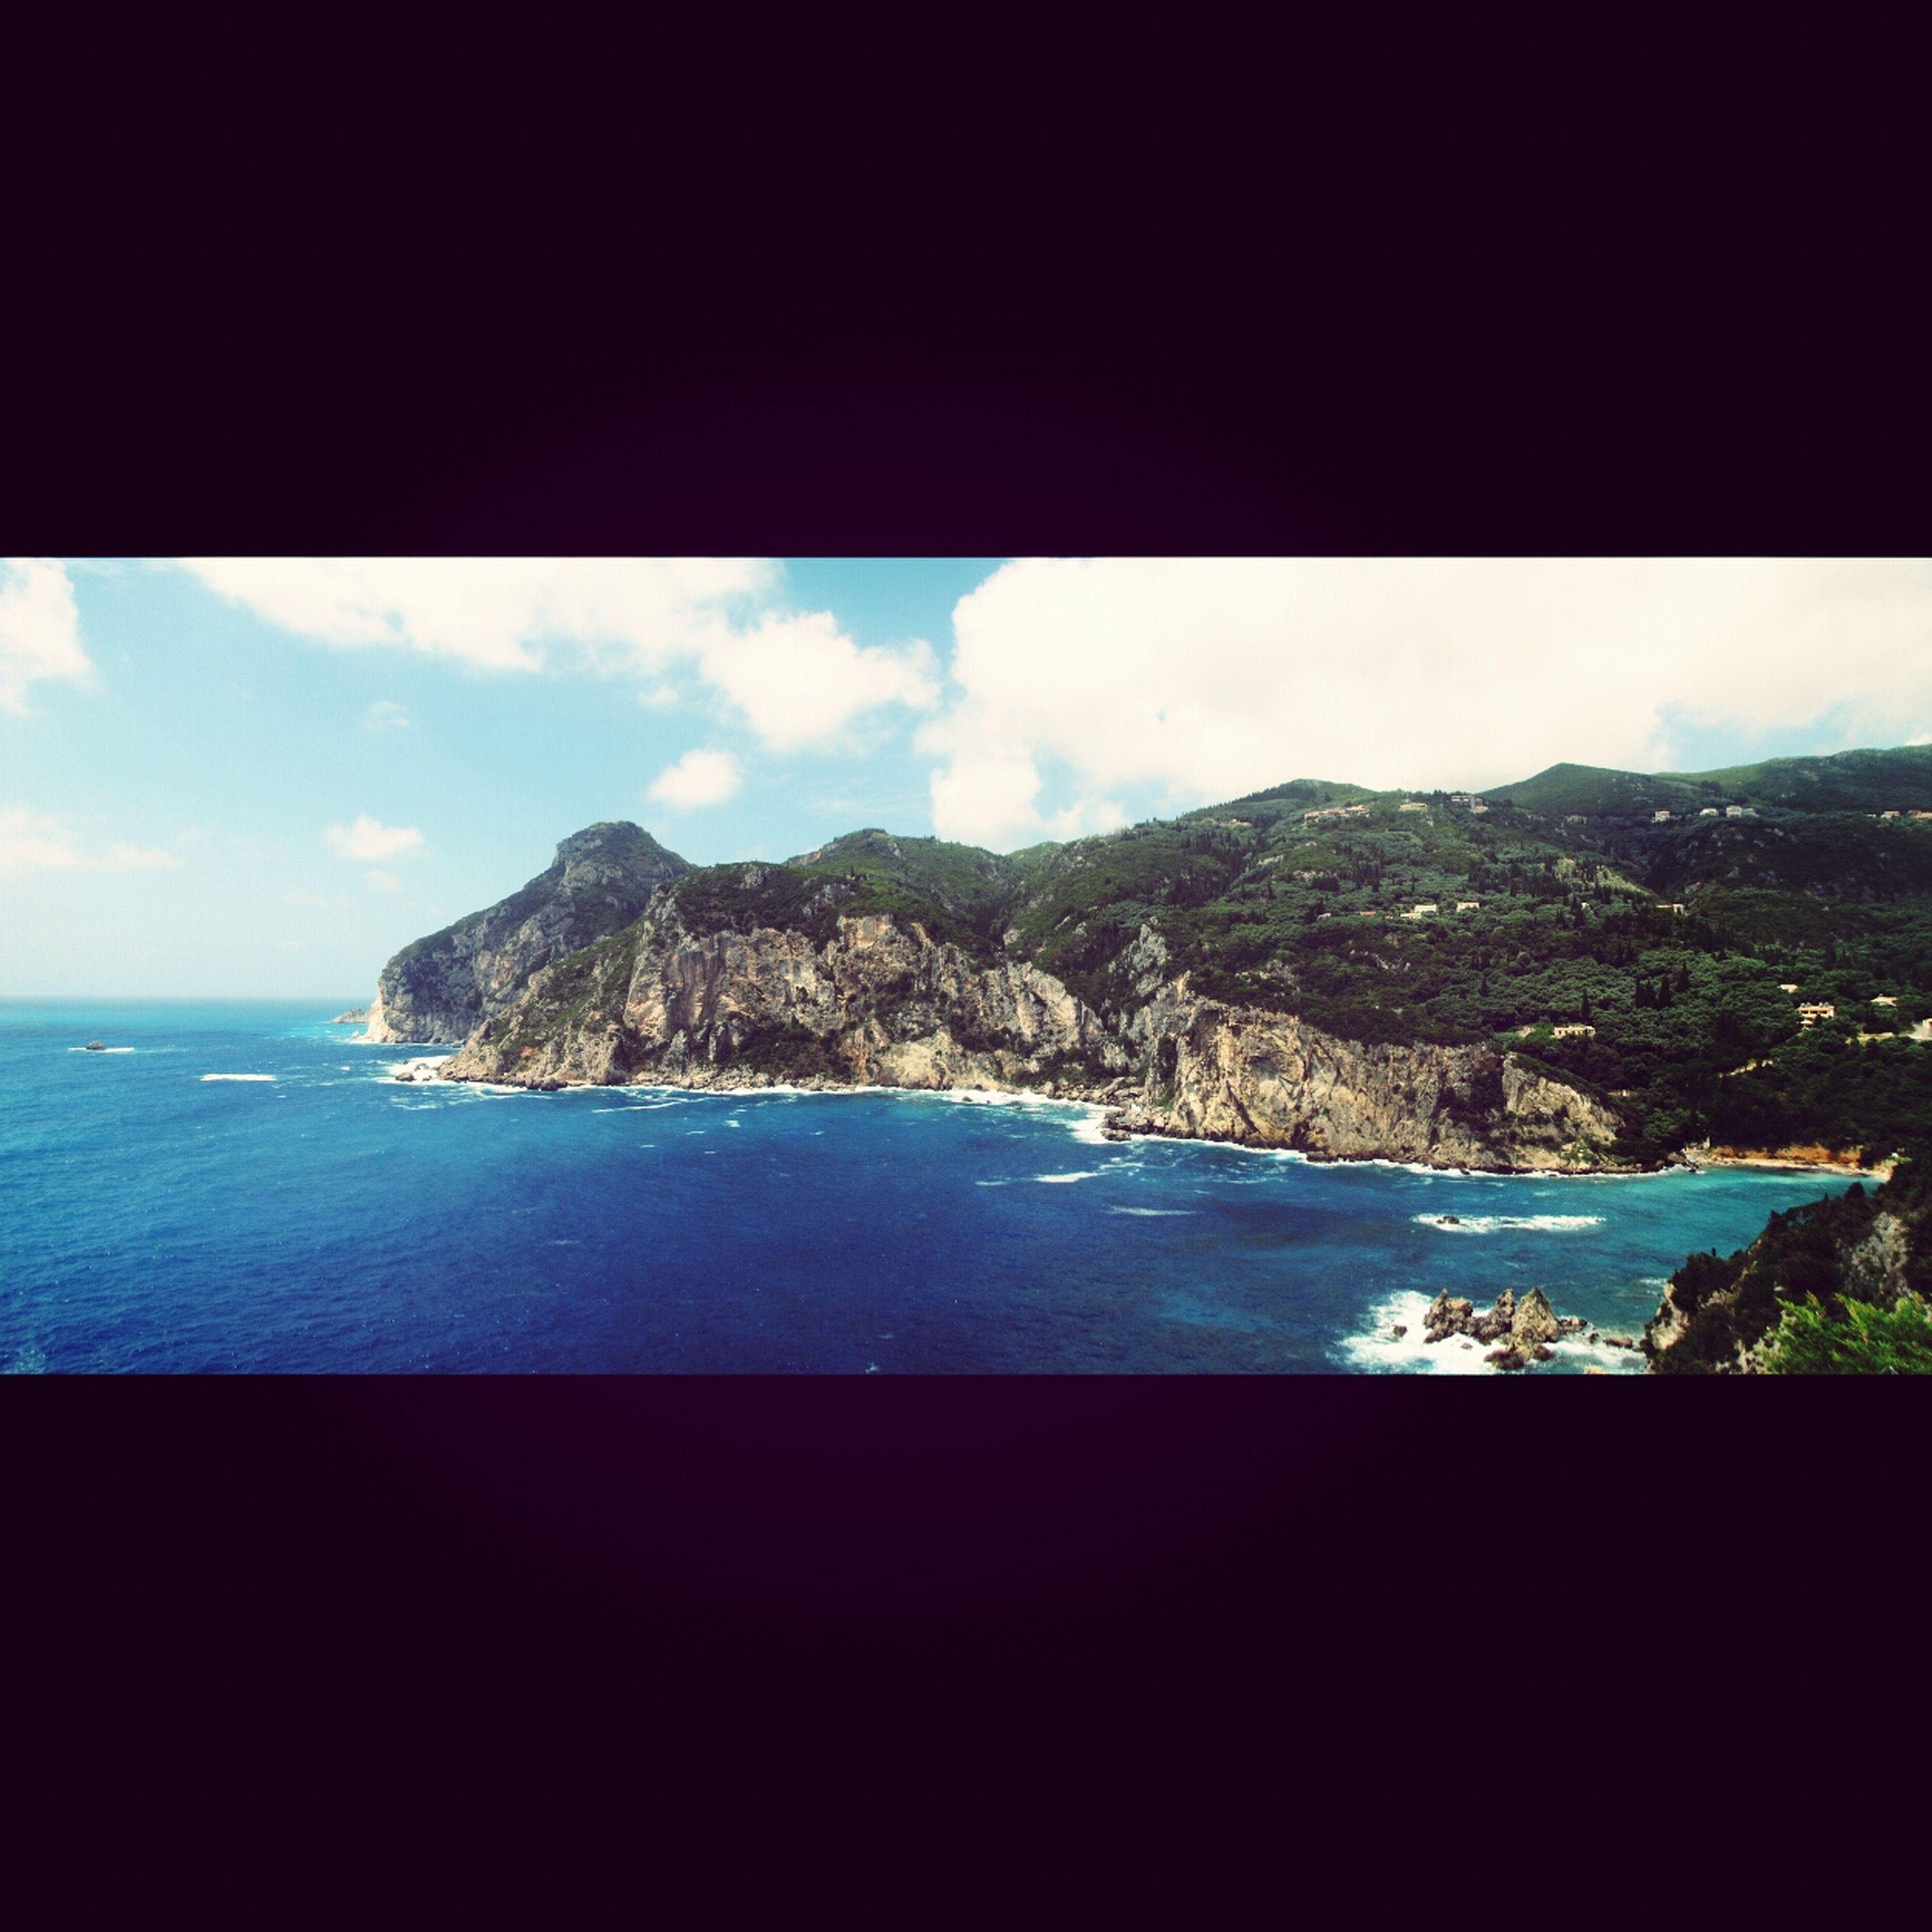 sea, water, sky, scenics, mountain, beauty in nature, tranquil scene, tranquility, horizon over water, nature, cloud - sky, idyllic, beach, coastline, blue, mountain range, shore, cloud, rock - object, day